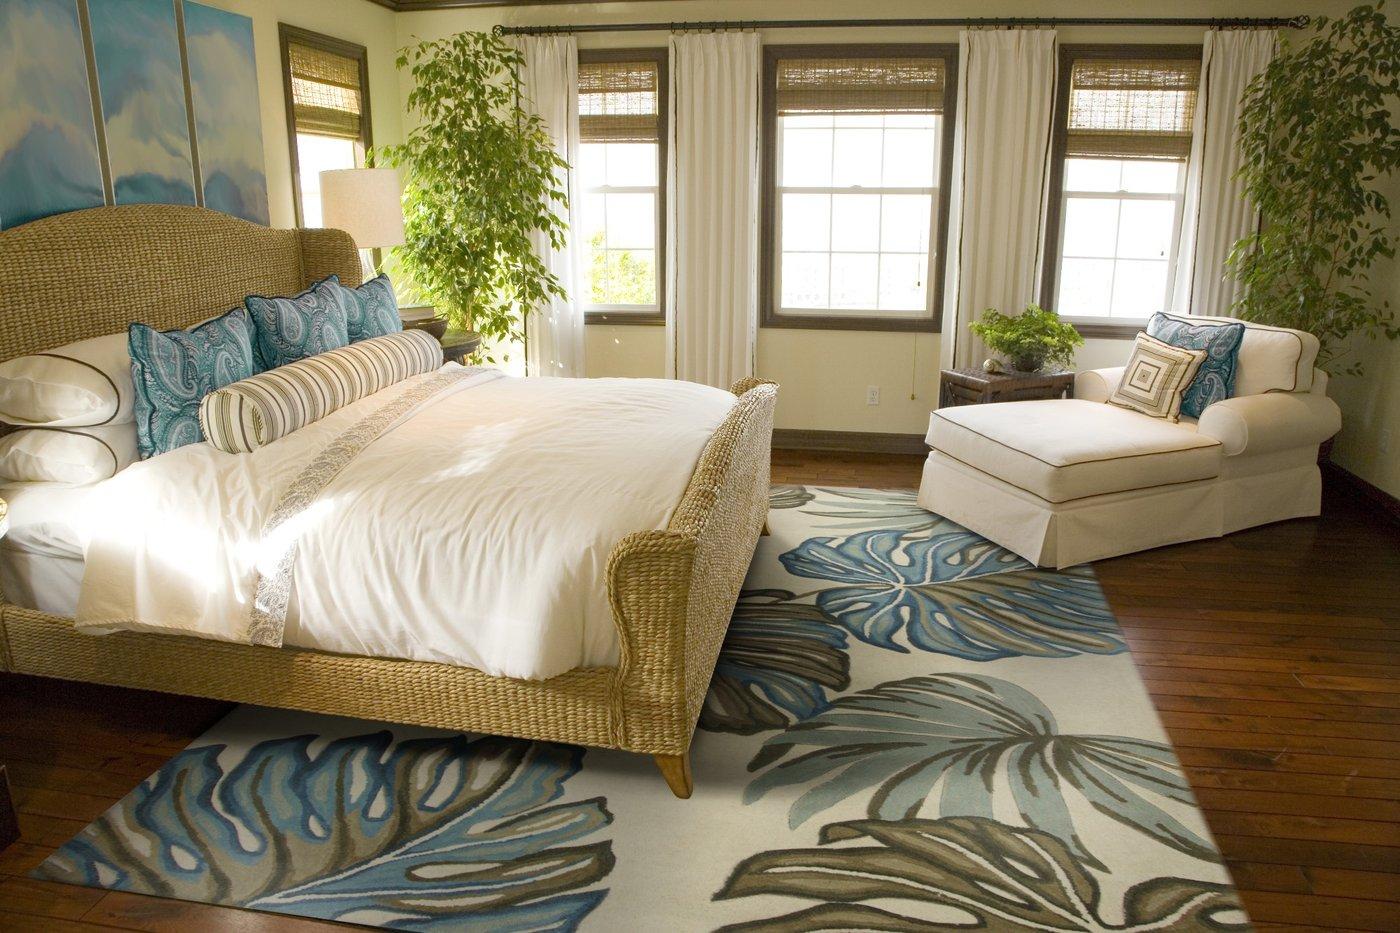 Tropical Escape Bedroom Decor Ideas